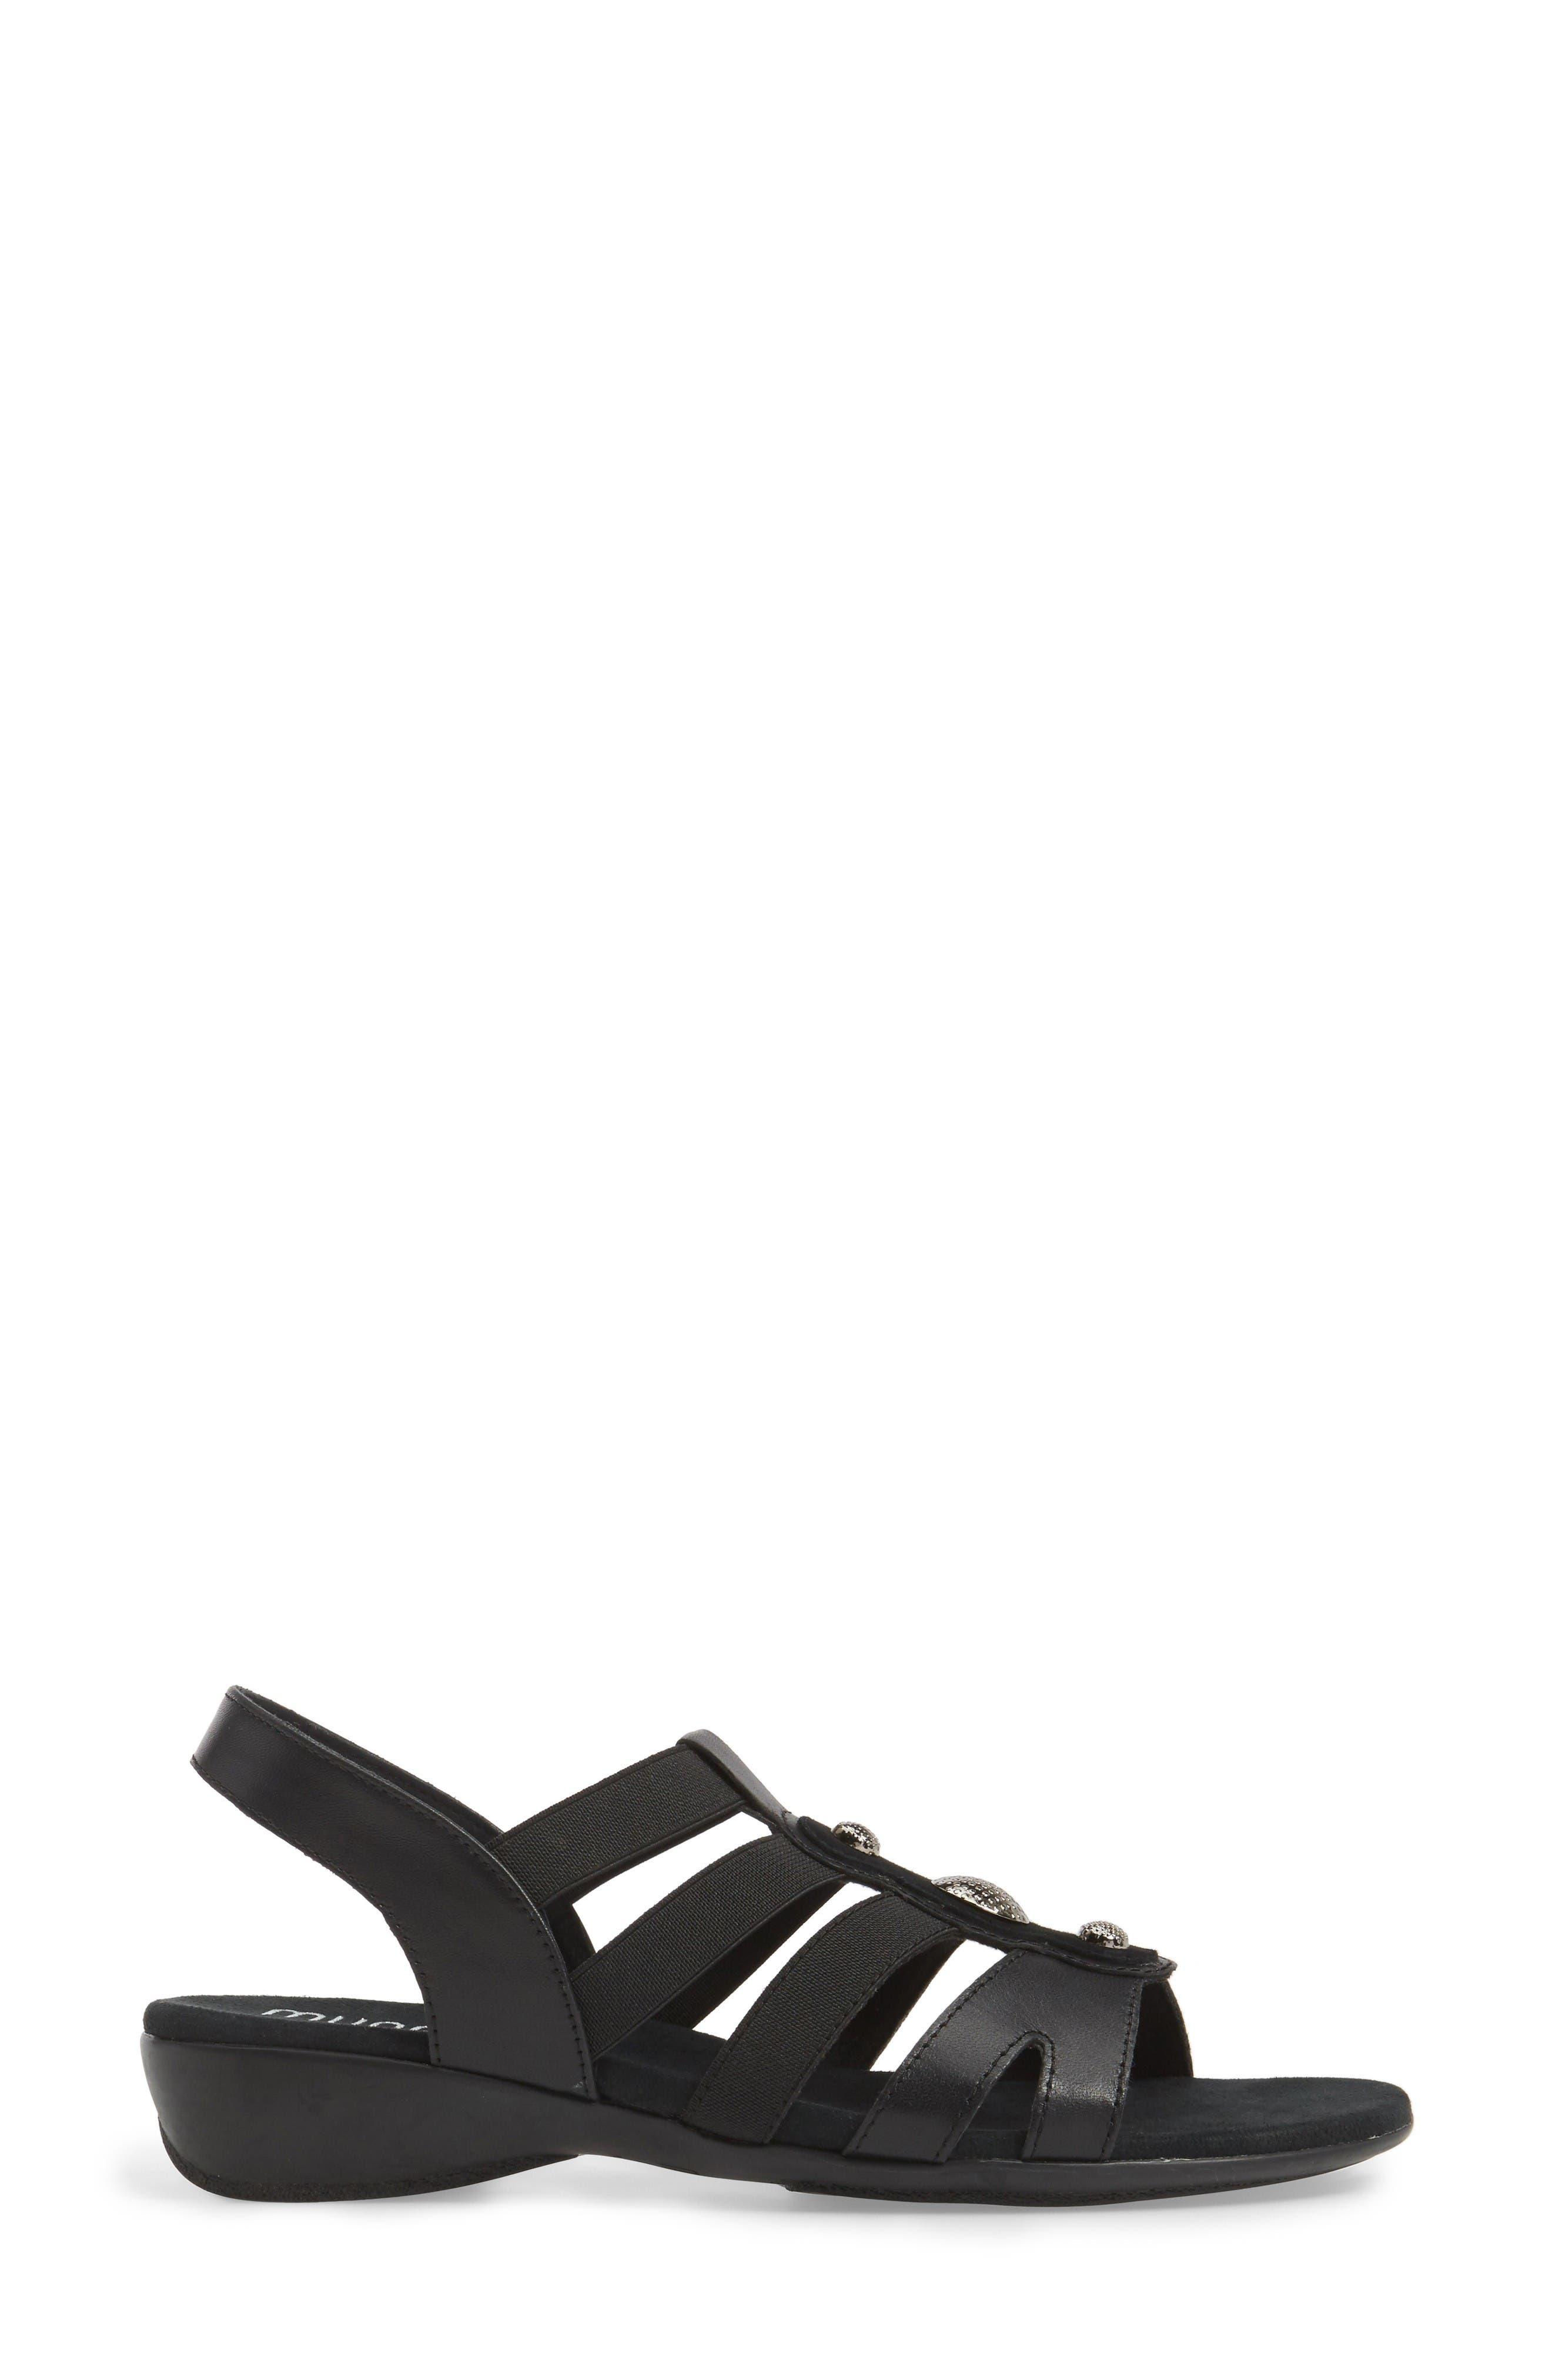 Destiny Sandal,                             Alternate thumbnail 3, color,                             Black Leather